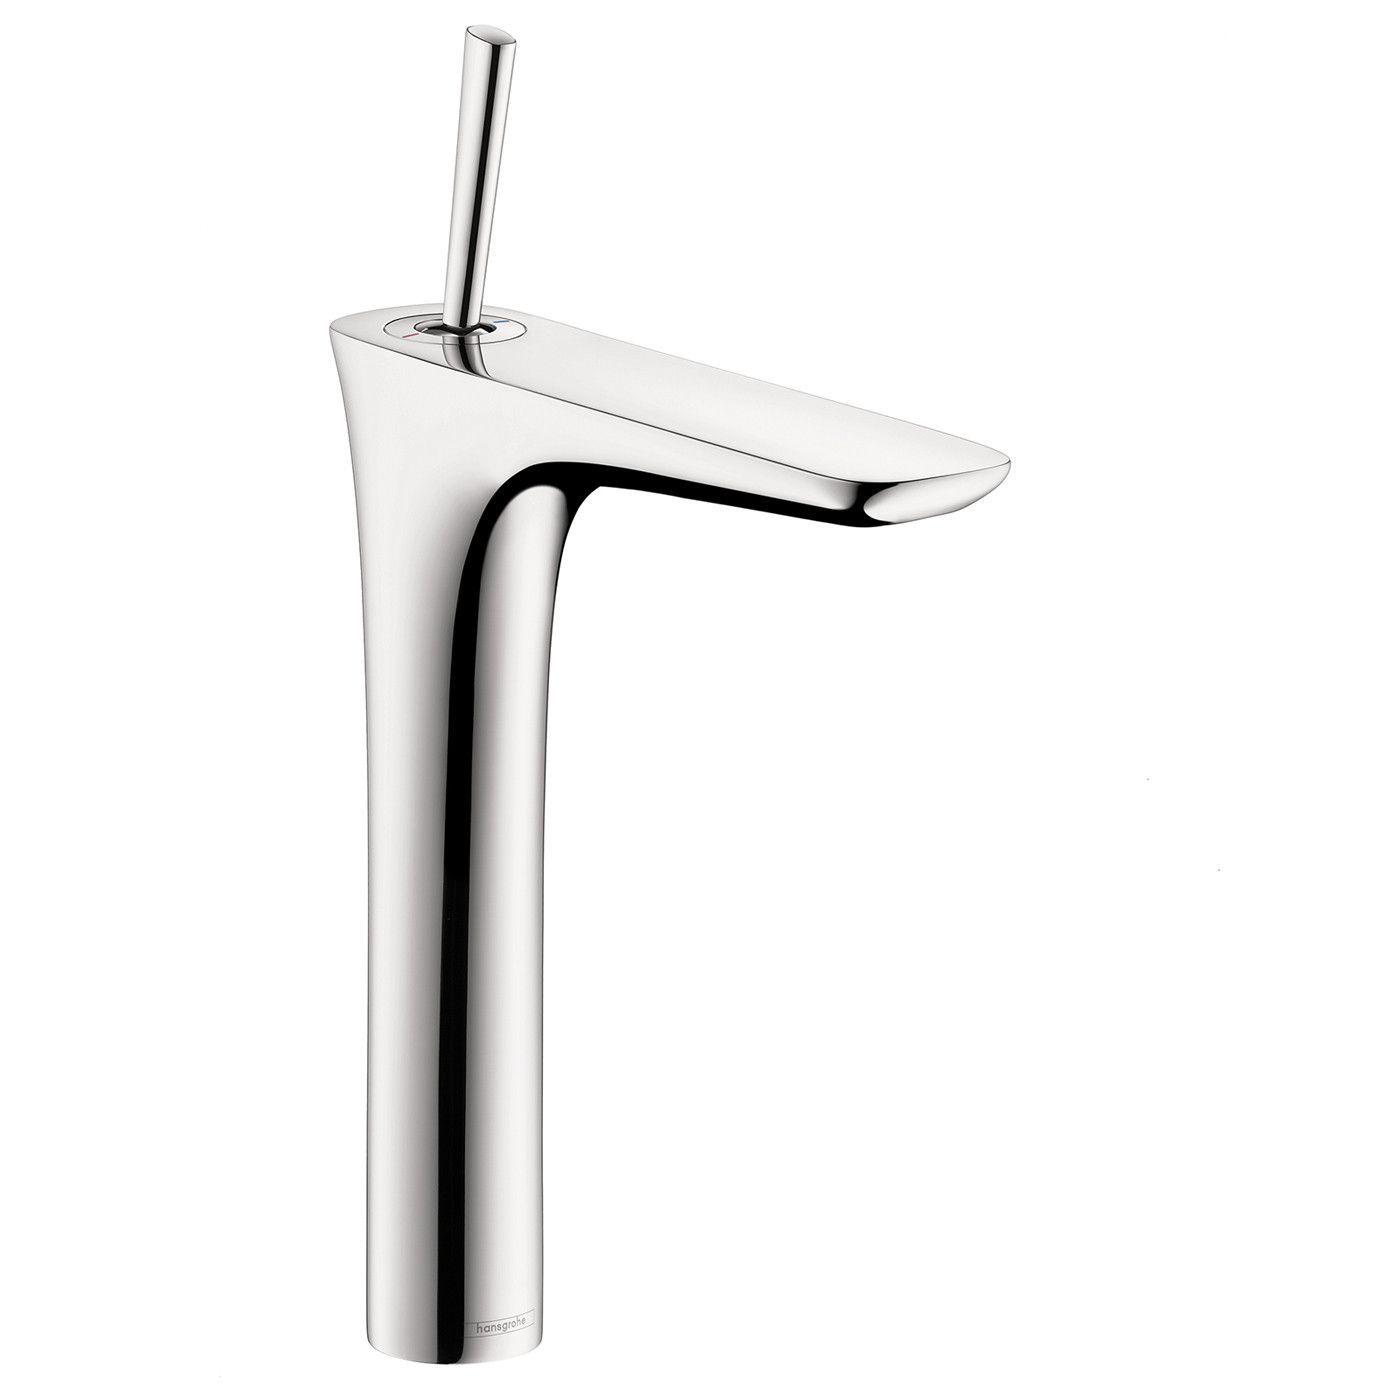 hansgrohe kitchen faucet organization tips 15072001 chrome puravida bathroom vessel